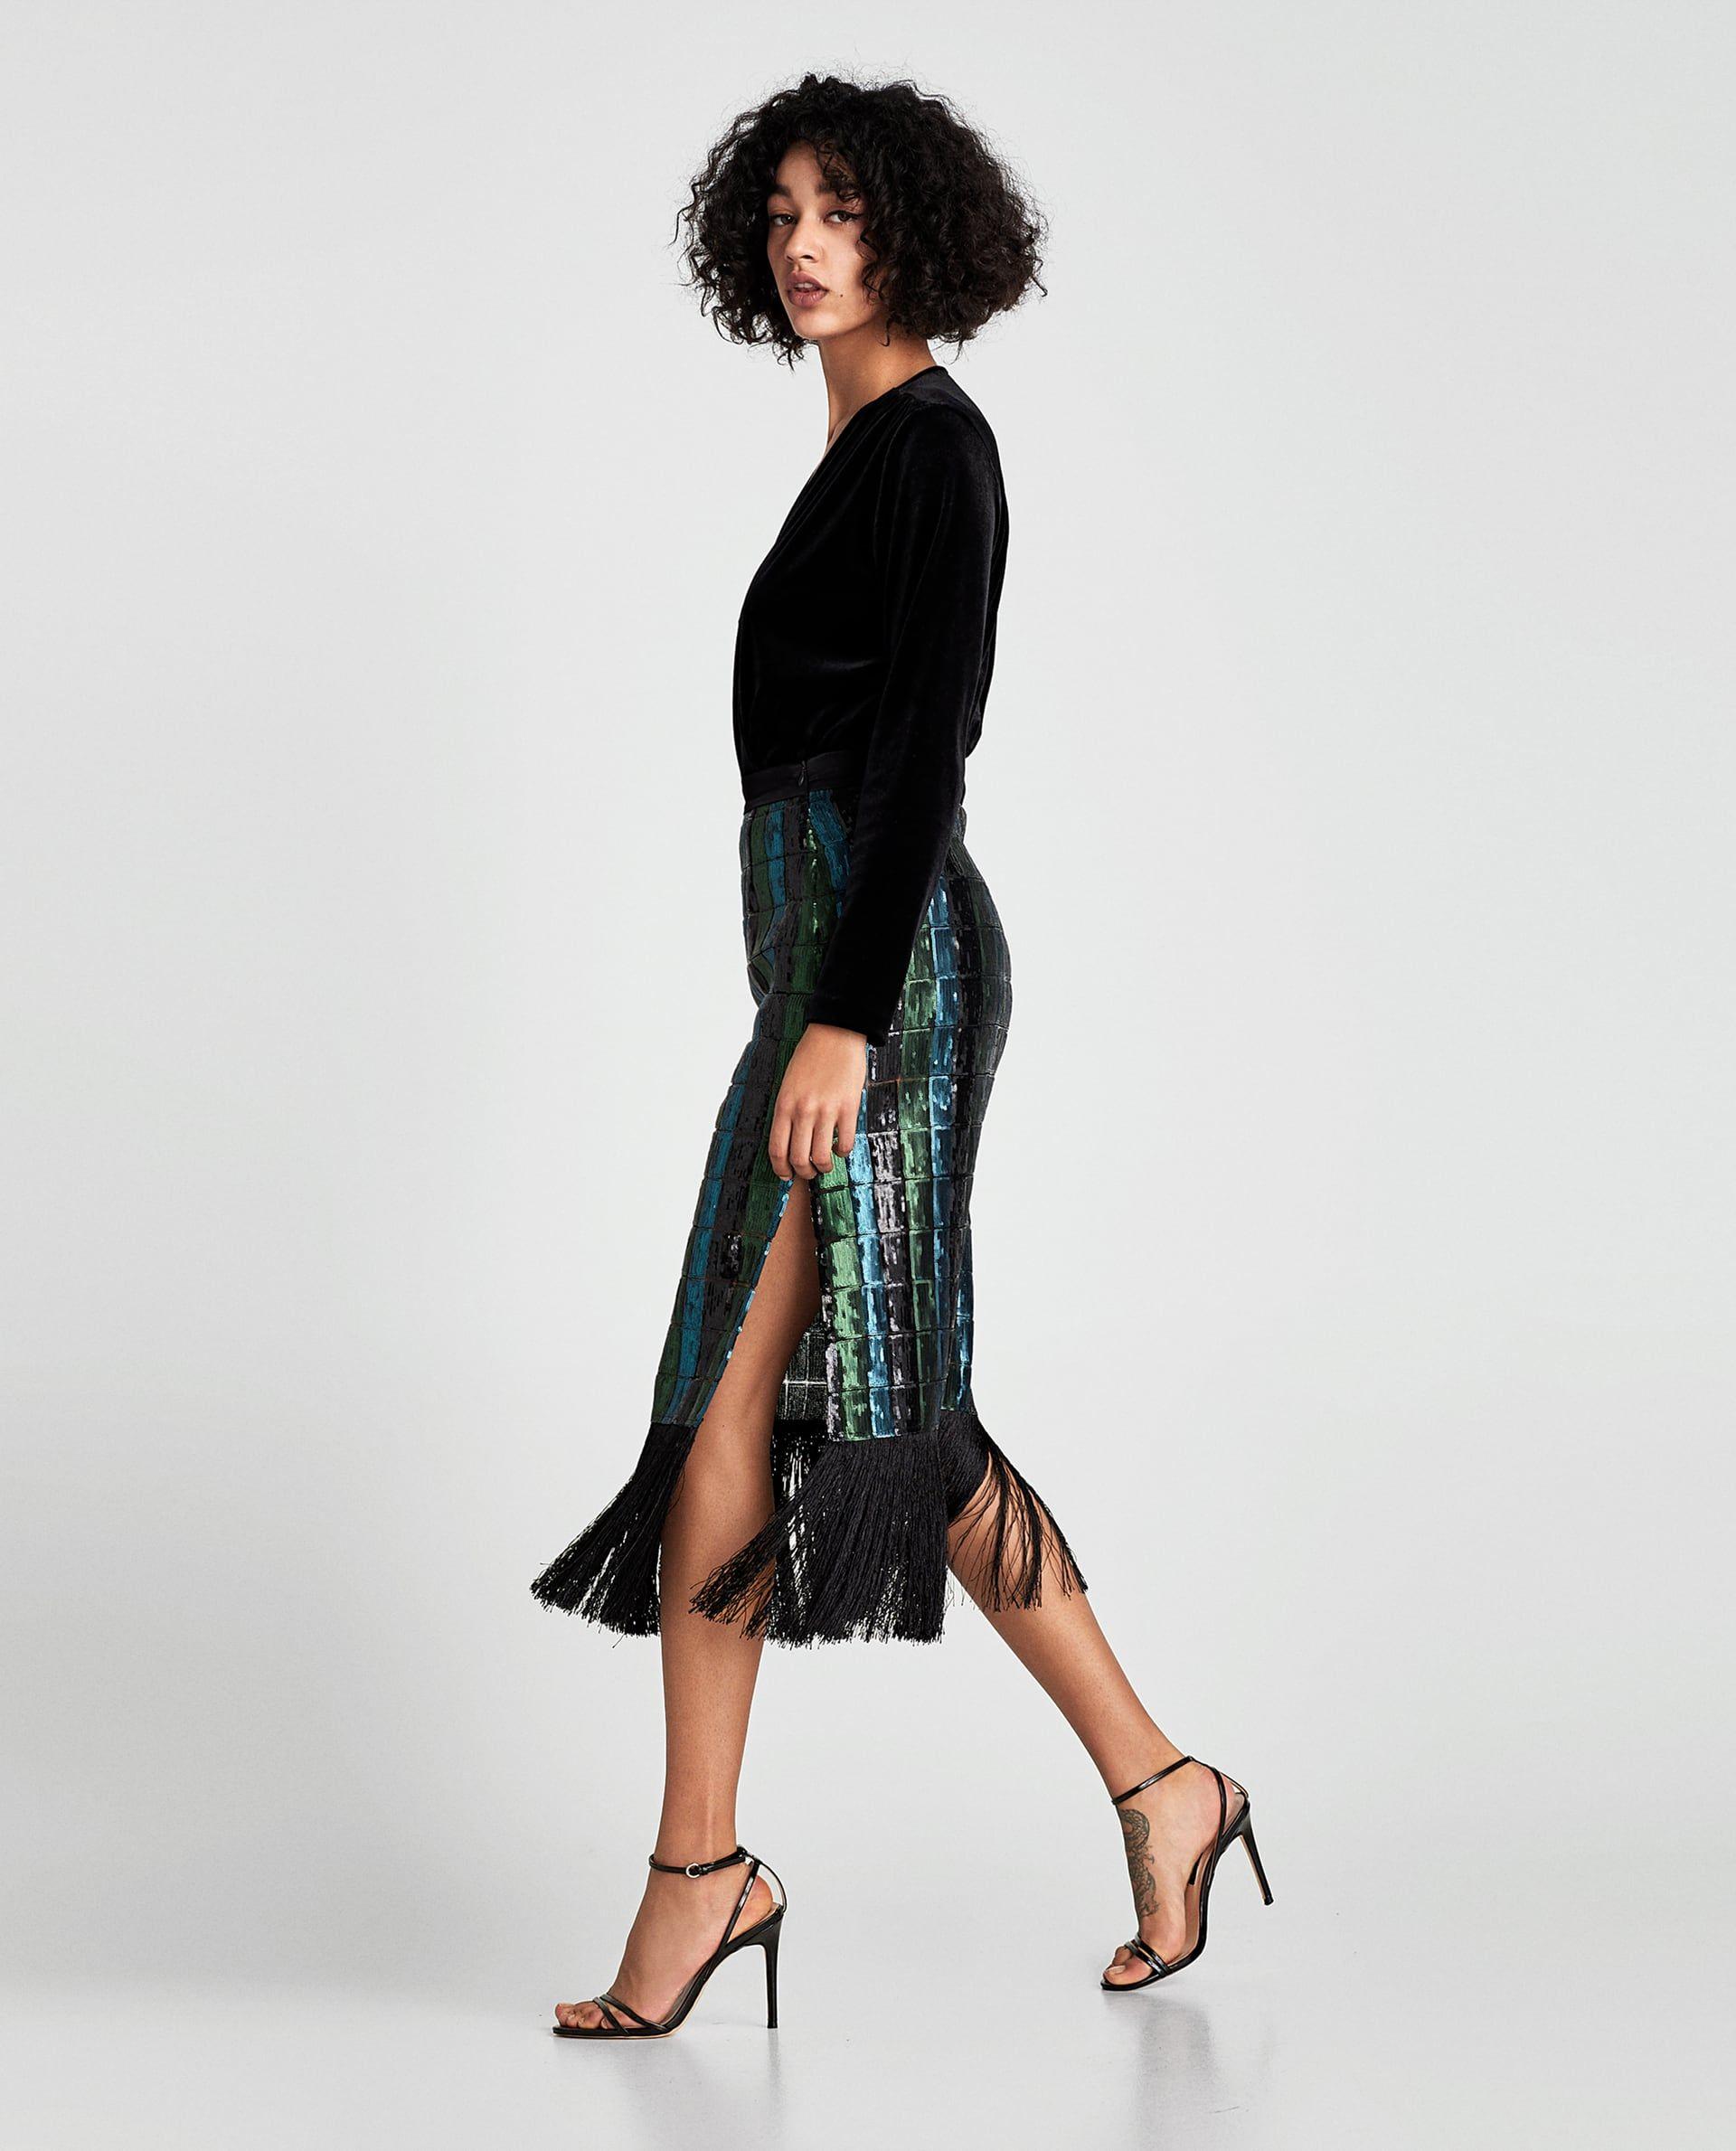 SEQUINNED SKIRT WITH FRINGE | Style Inspirations | Pinterest